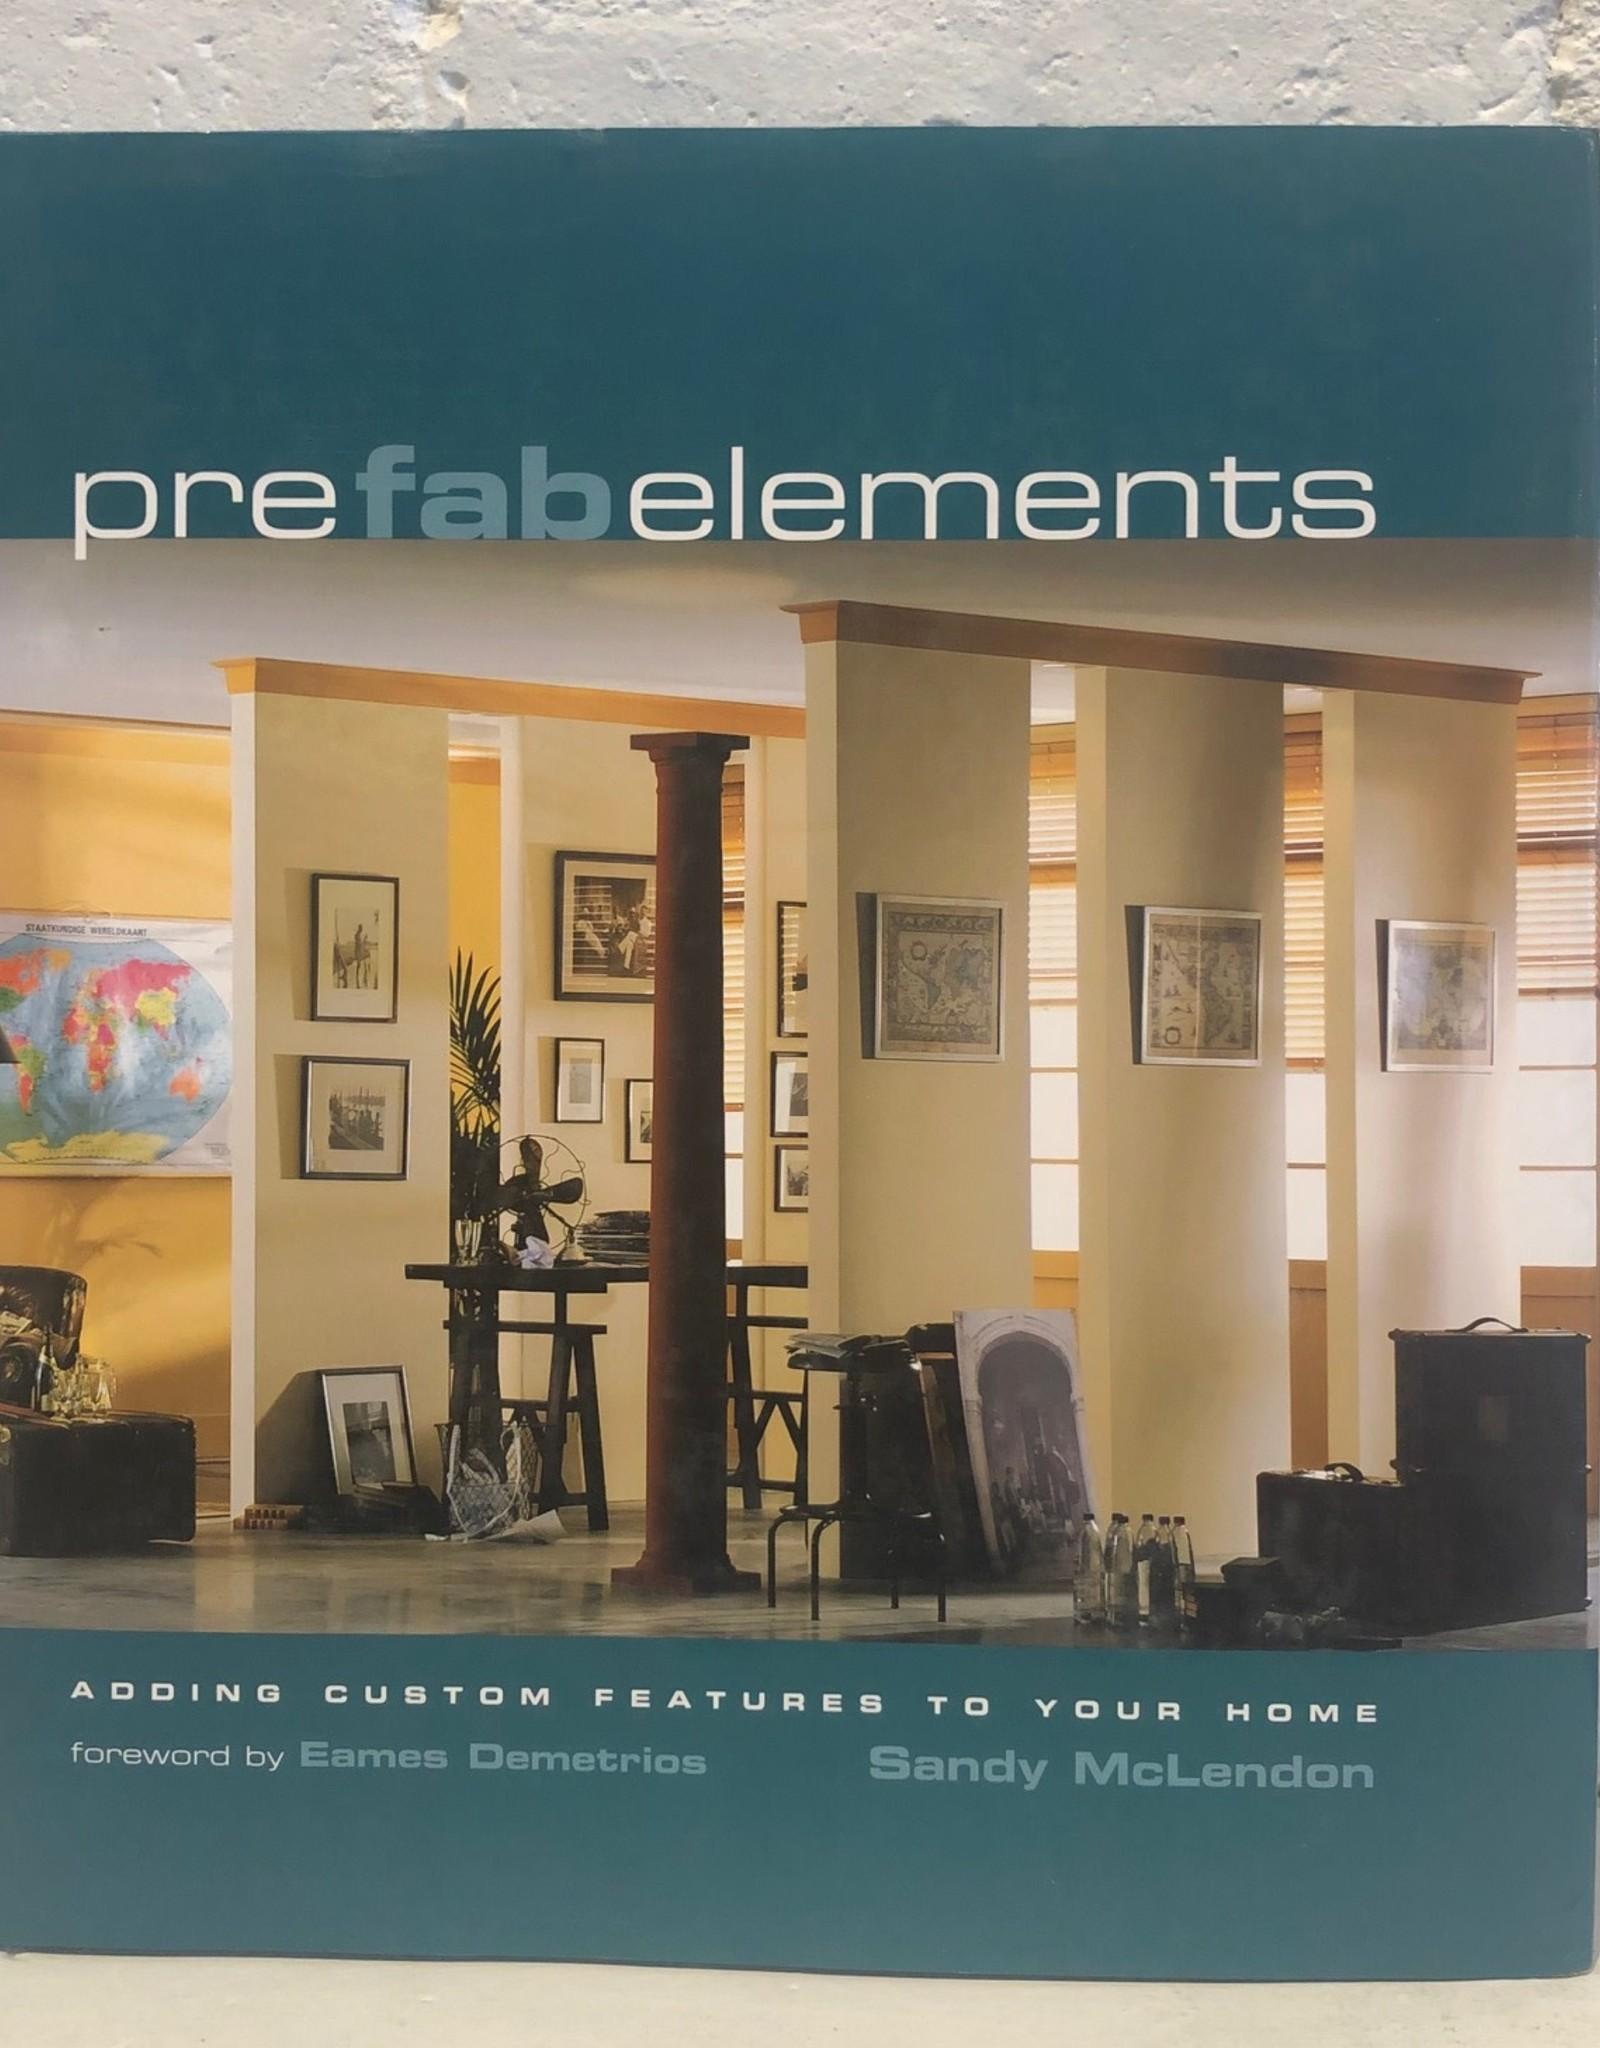 Prefab Elements by Sandy McLendon